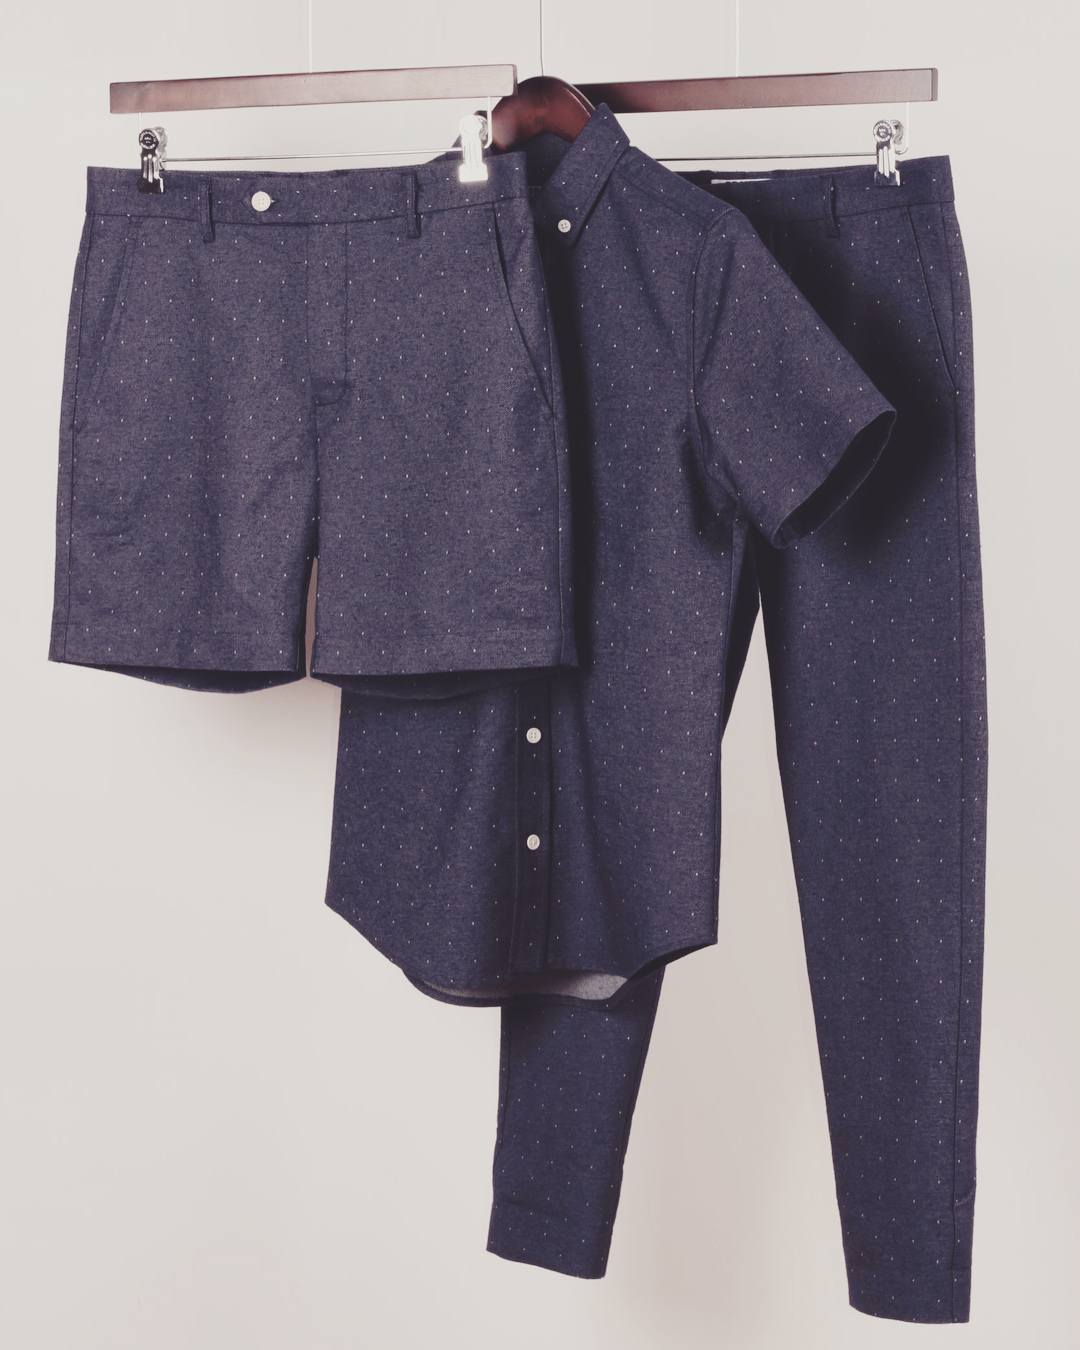 Clothing: Brave GentleMan